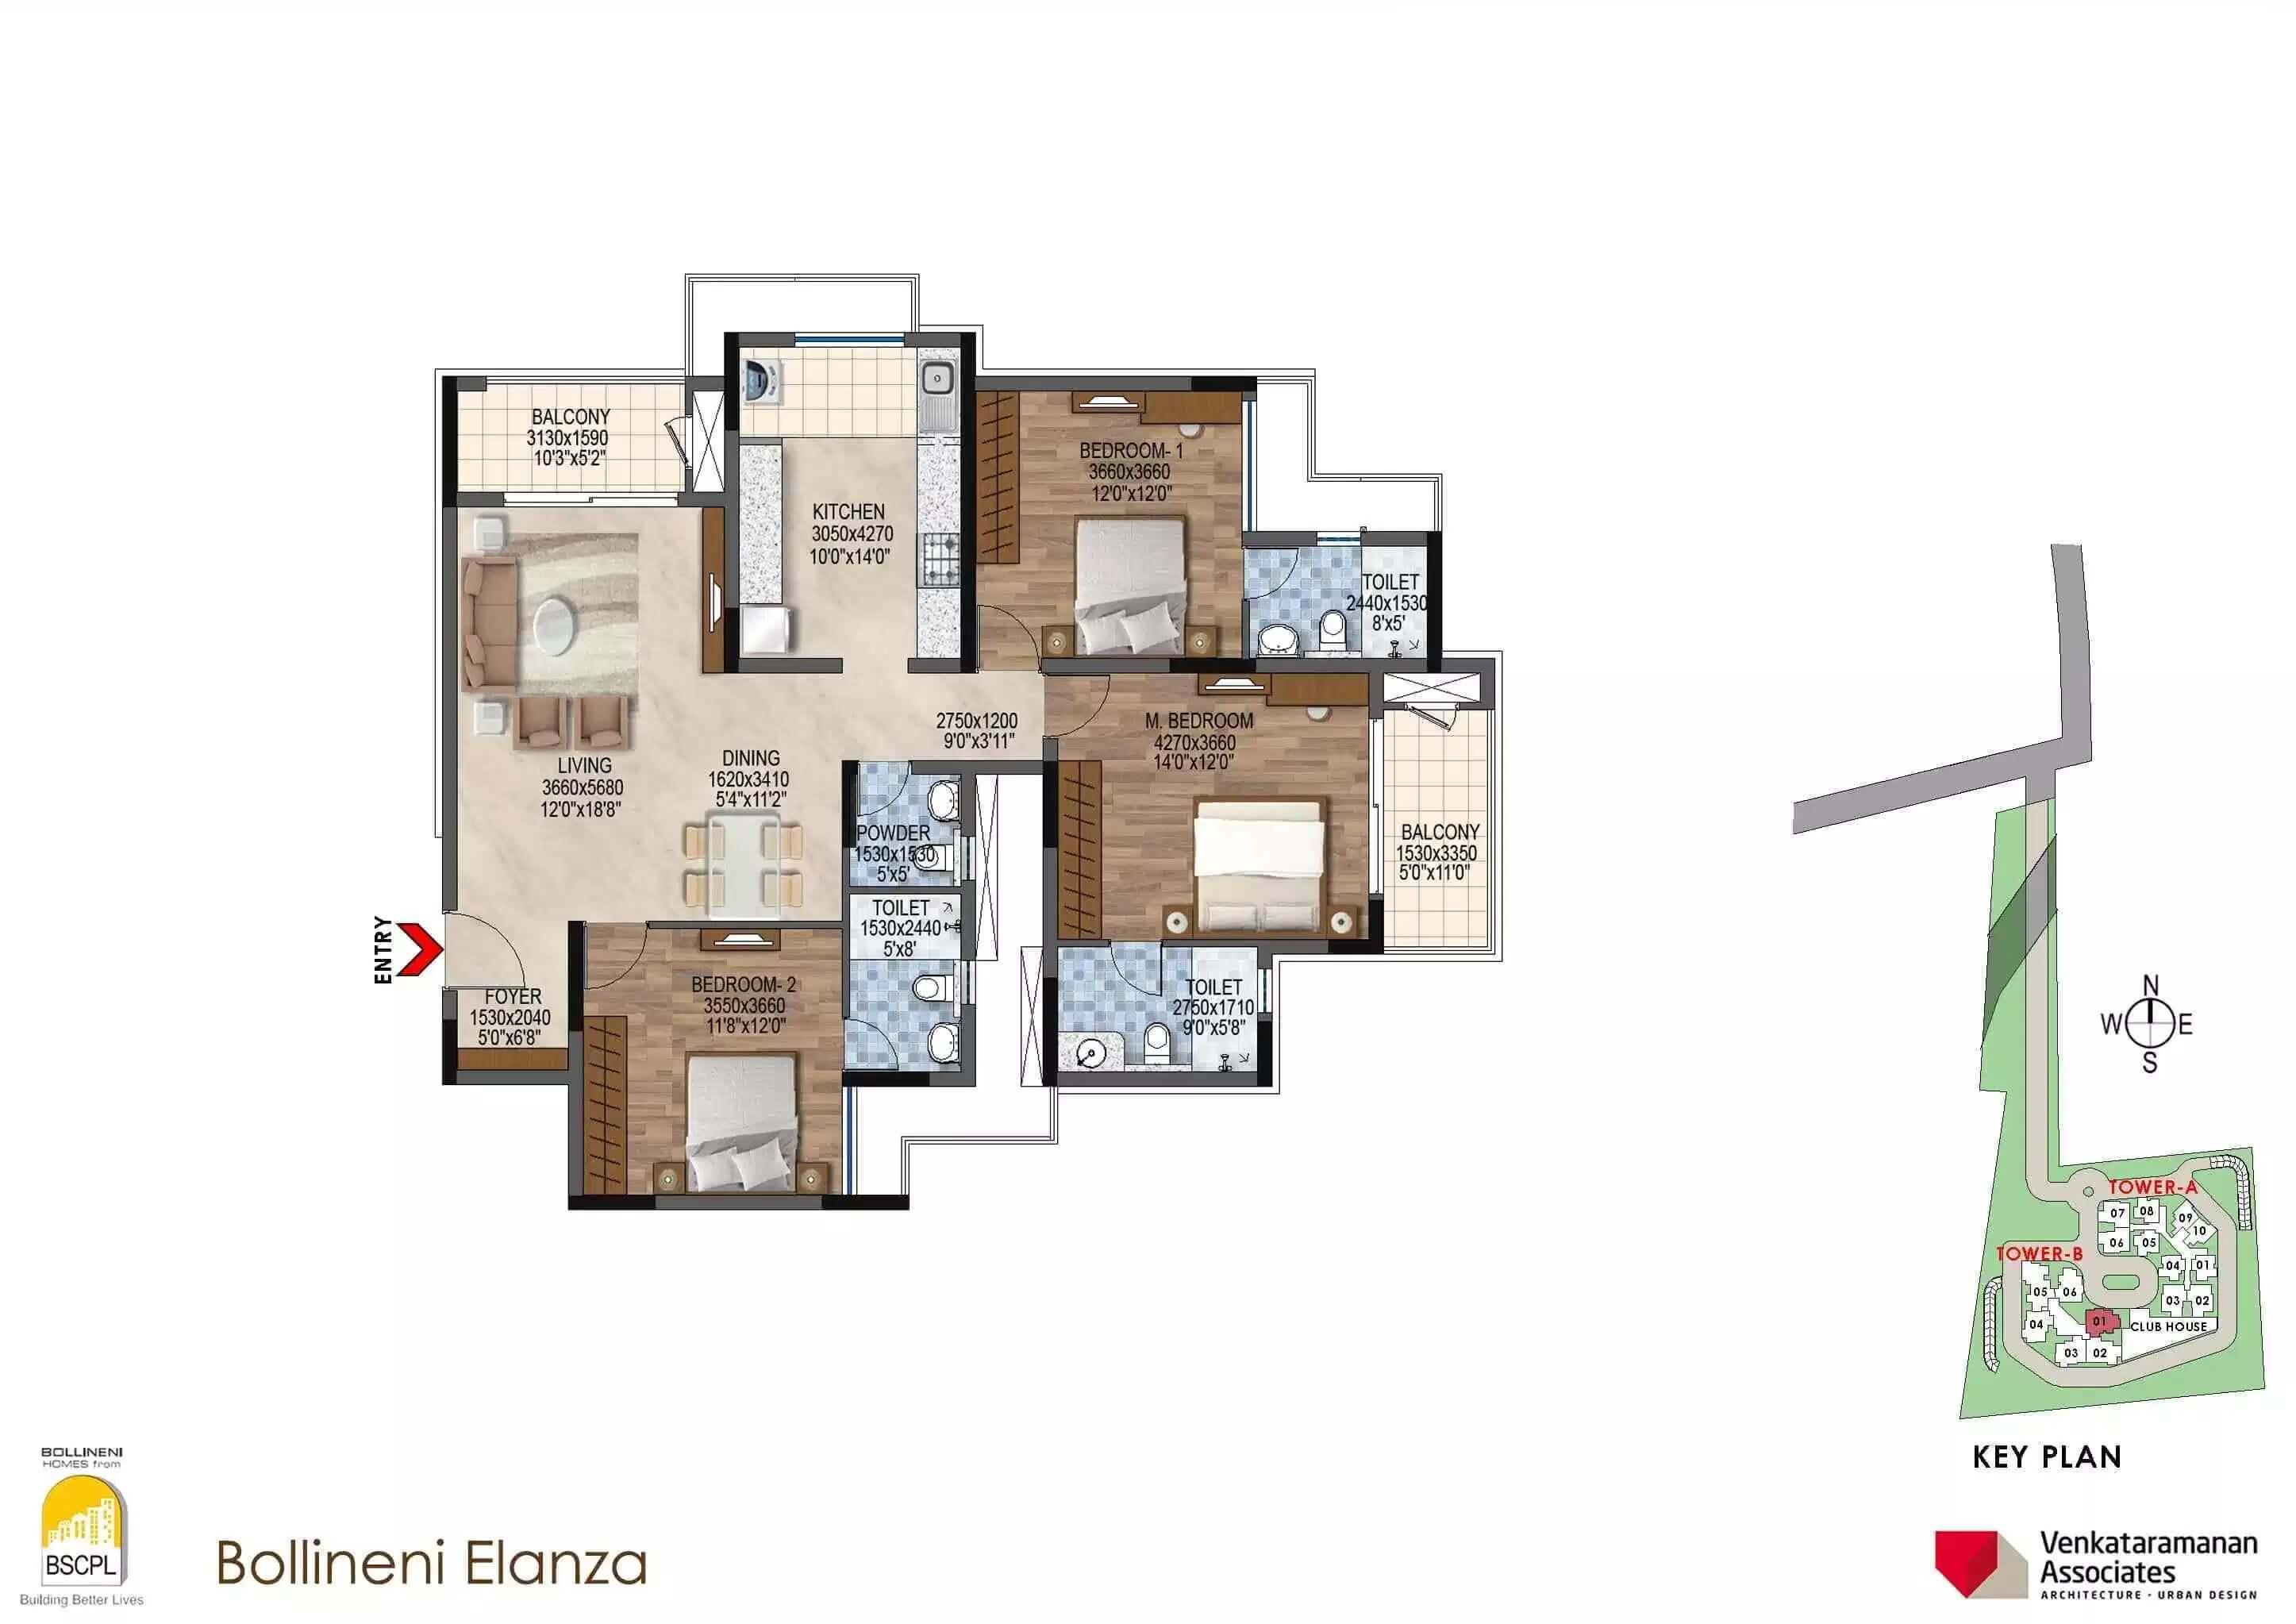 bscpl bollineni elanza apartment 3bhk 1780sqft 1